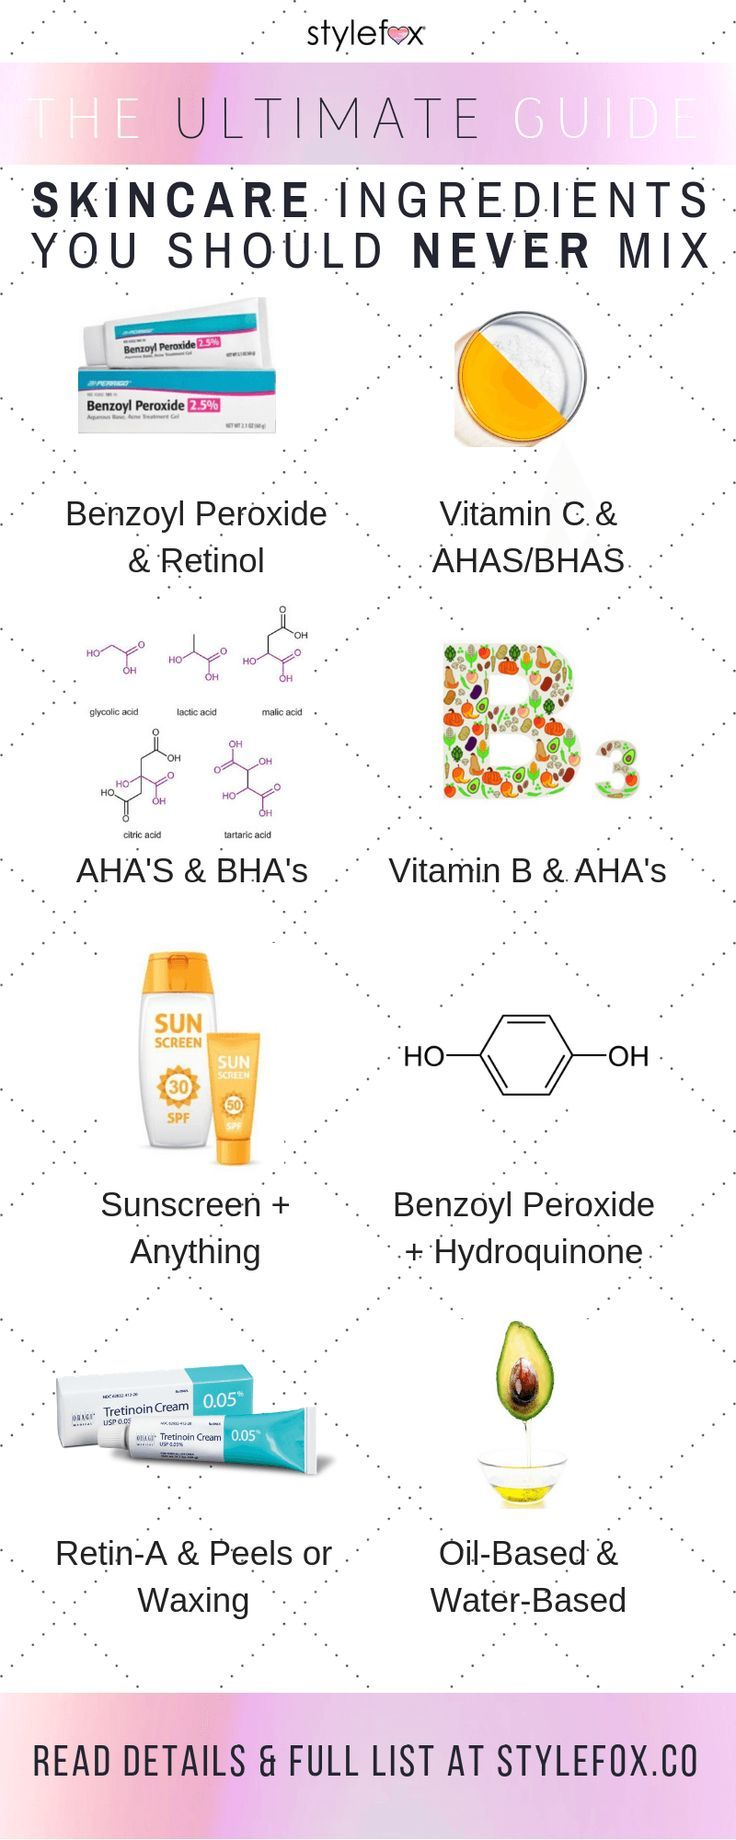 , The Ultimate Guide: Skincare Ingredients You Should NEVER Mix, Anja Rubik Blog, Anja Rubik Blog